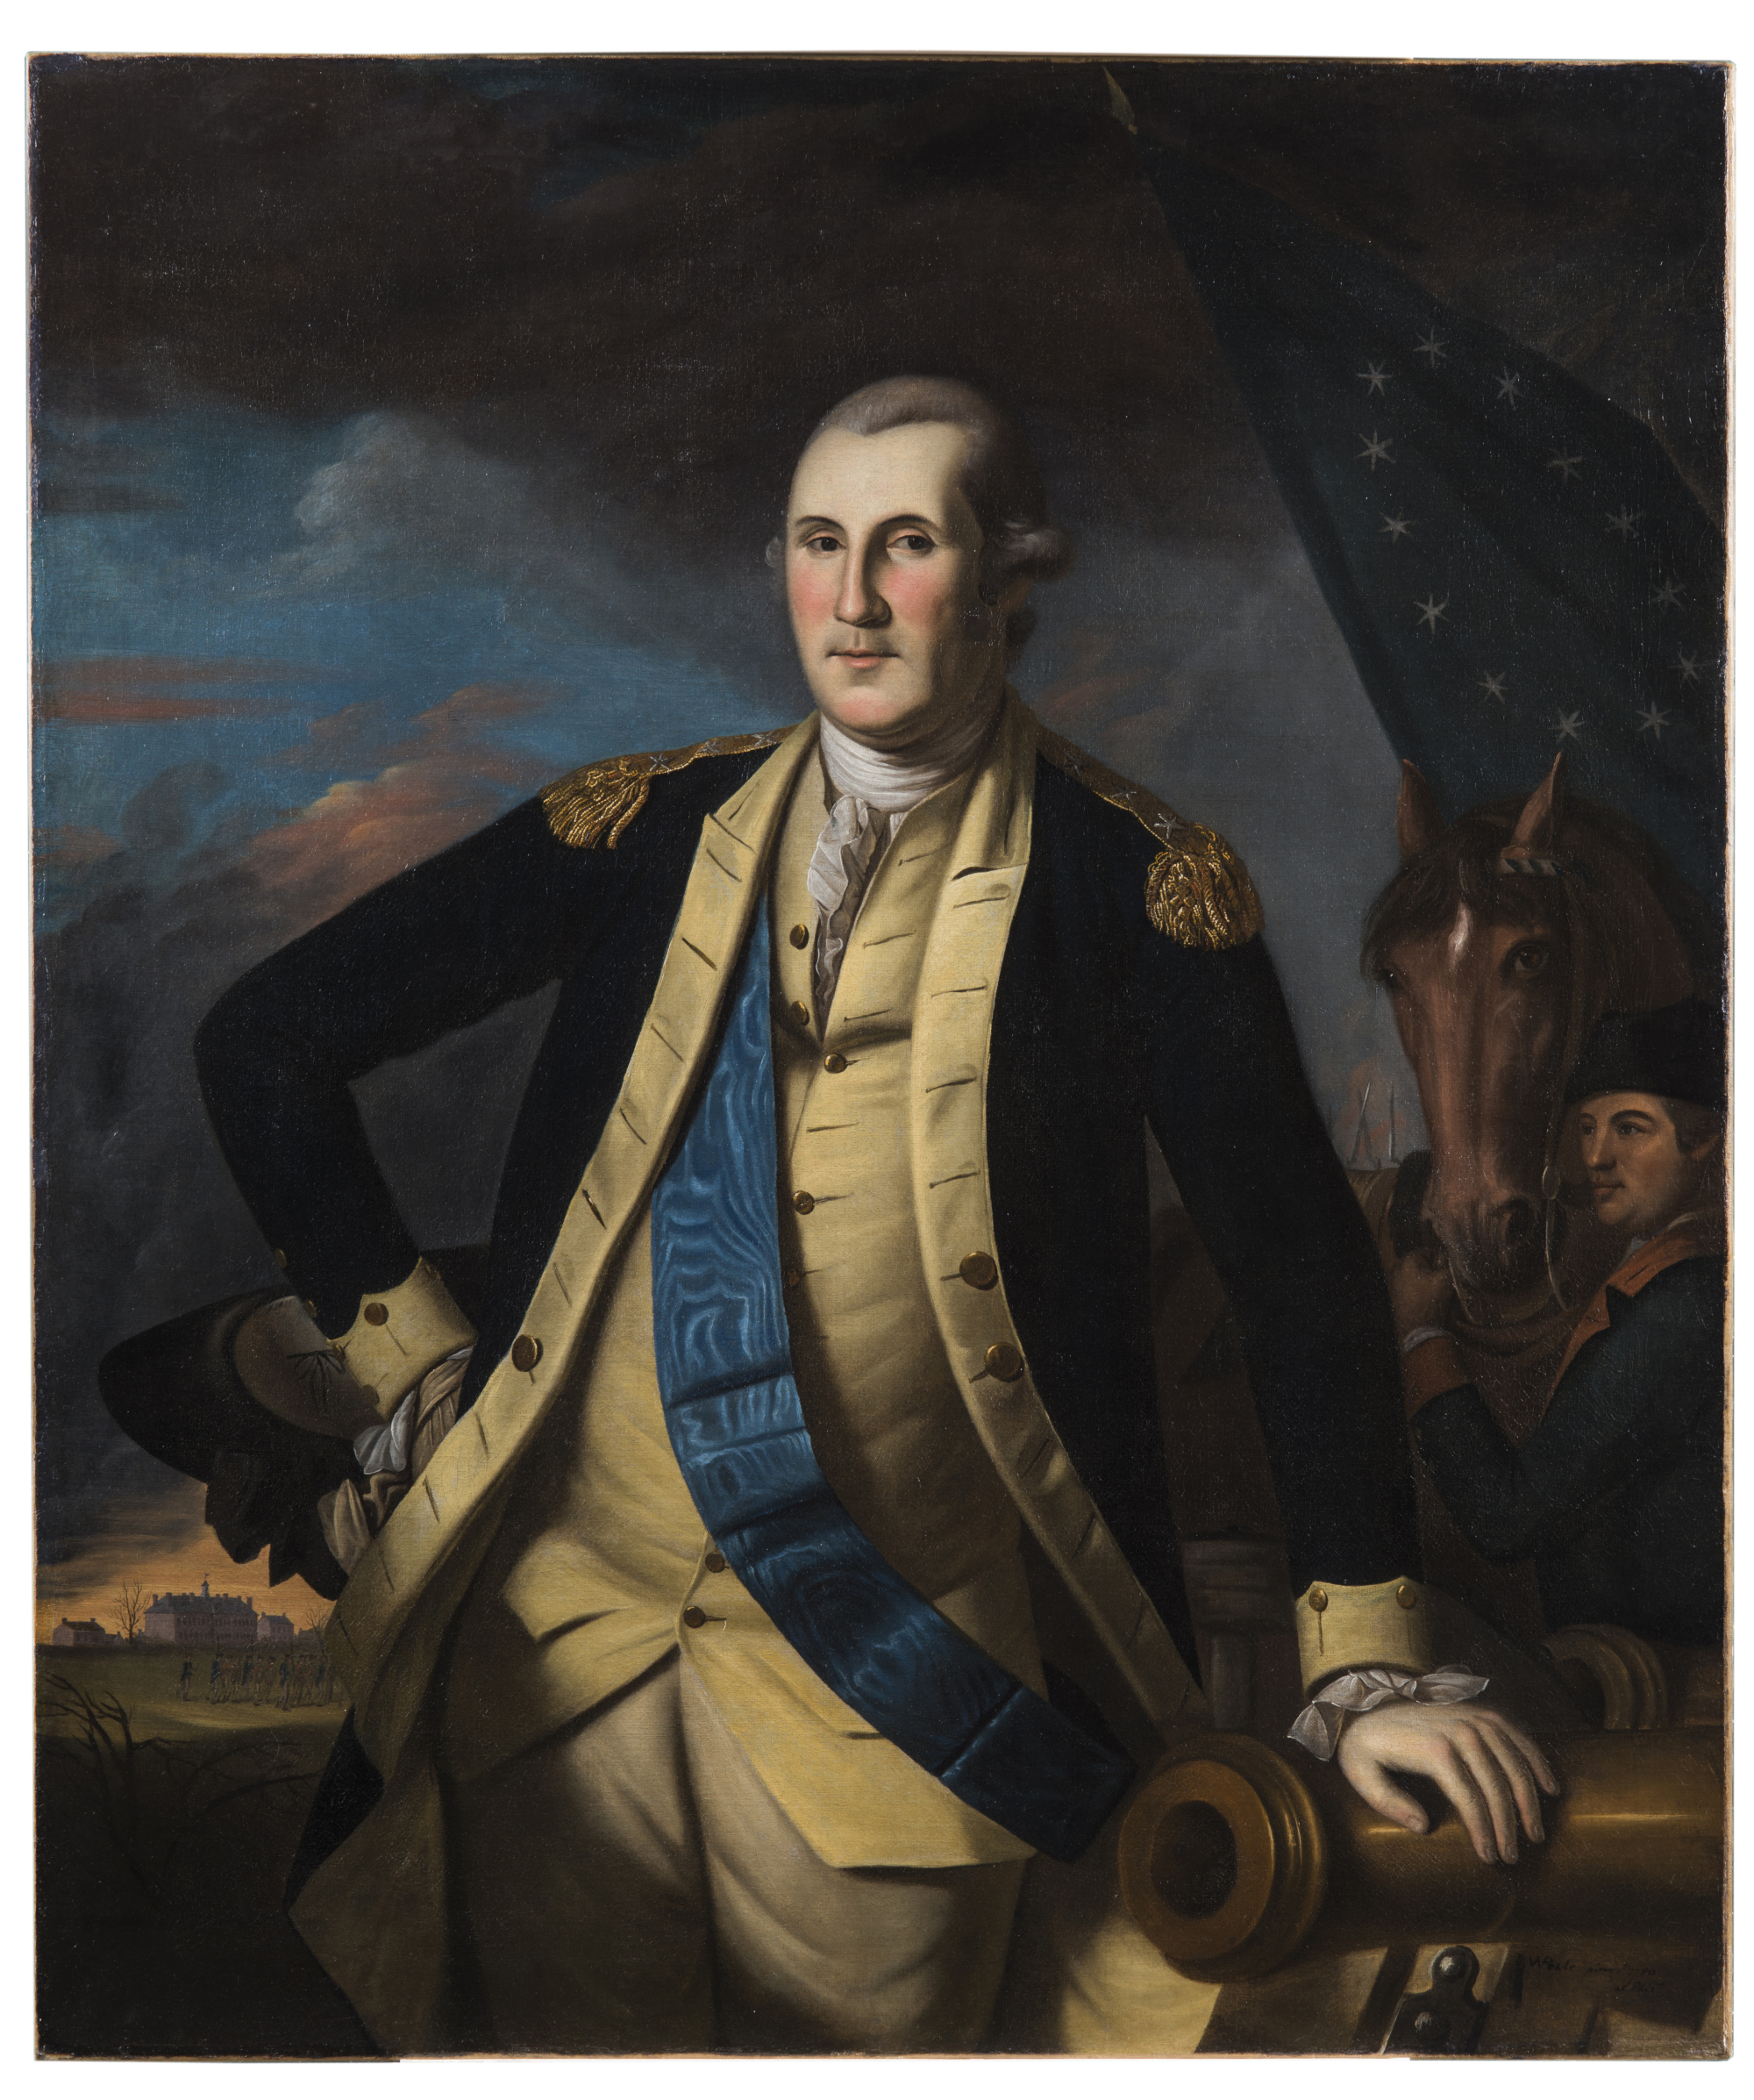 GEORGE WASHINGTON BATTLE OF PRINCETON PAINTING REVOLUTION WAR ART CANVASPRINT